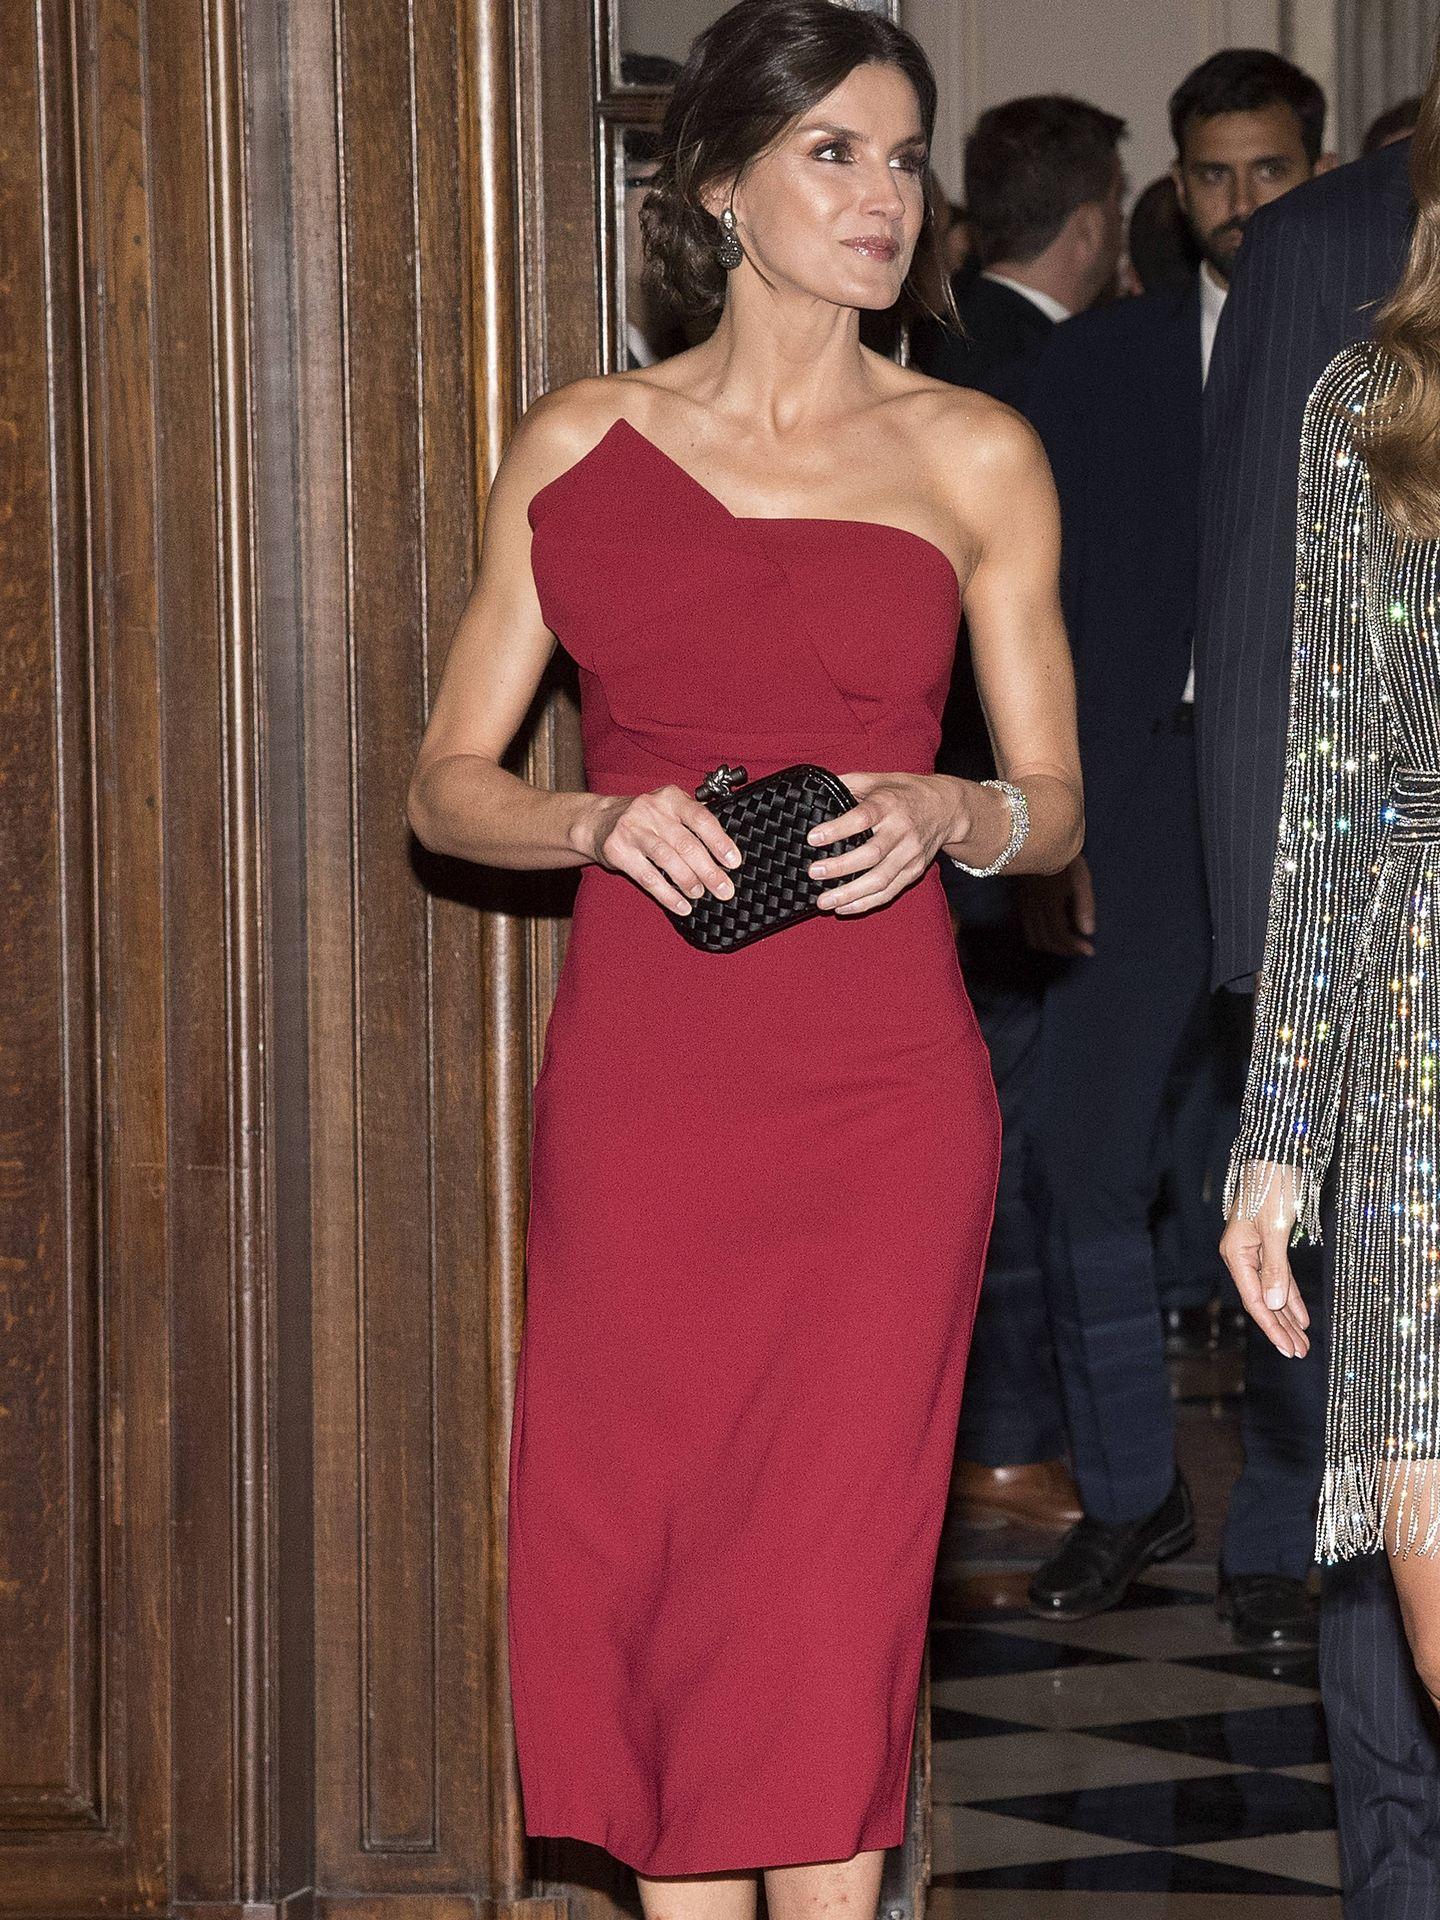 La reina Letizia, en Argentina. (EFE)